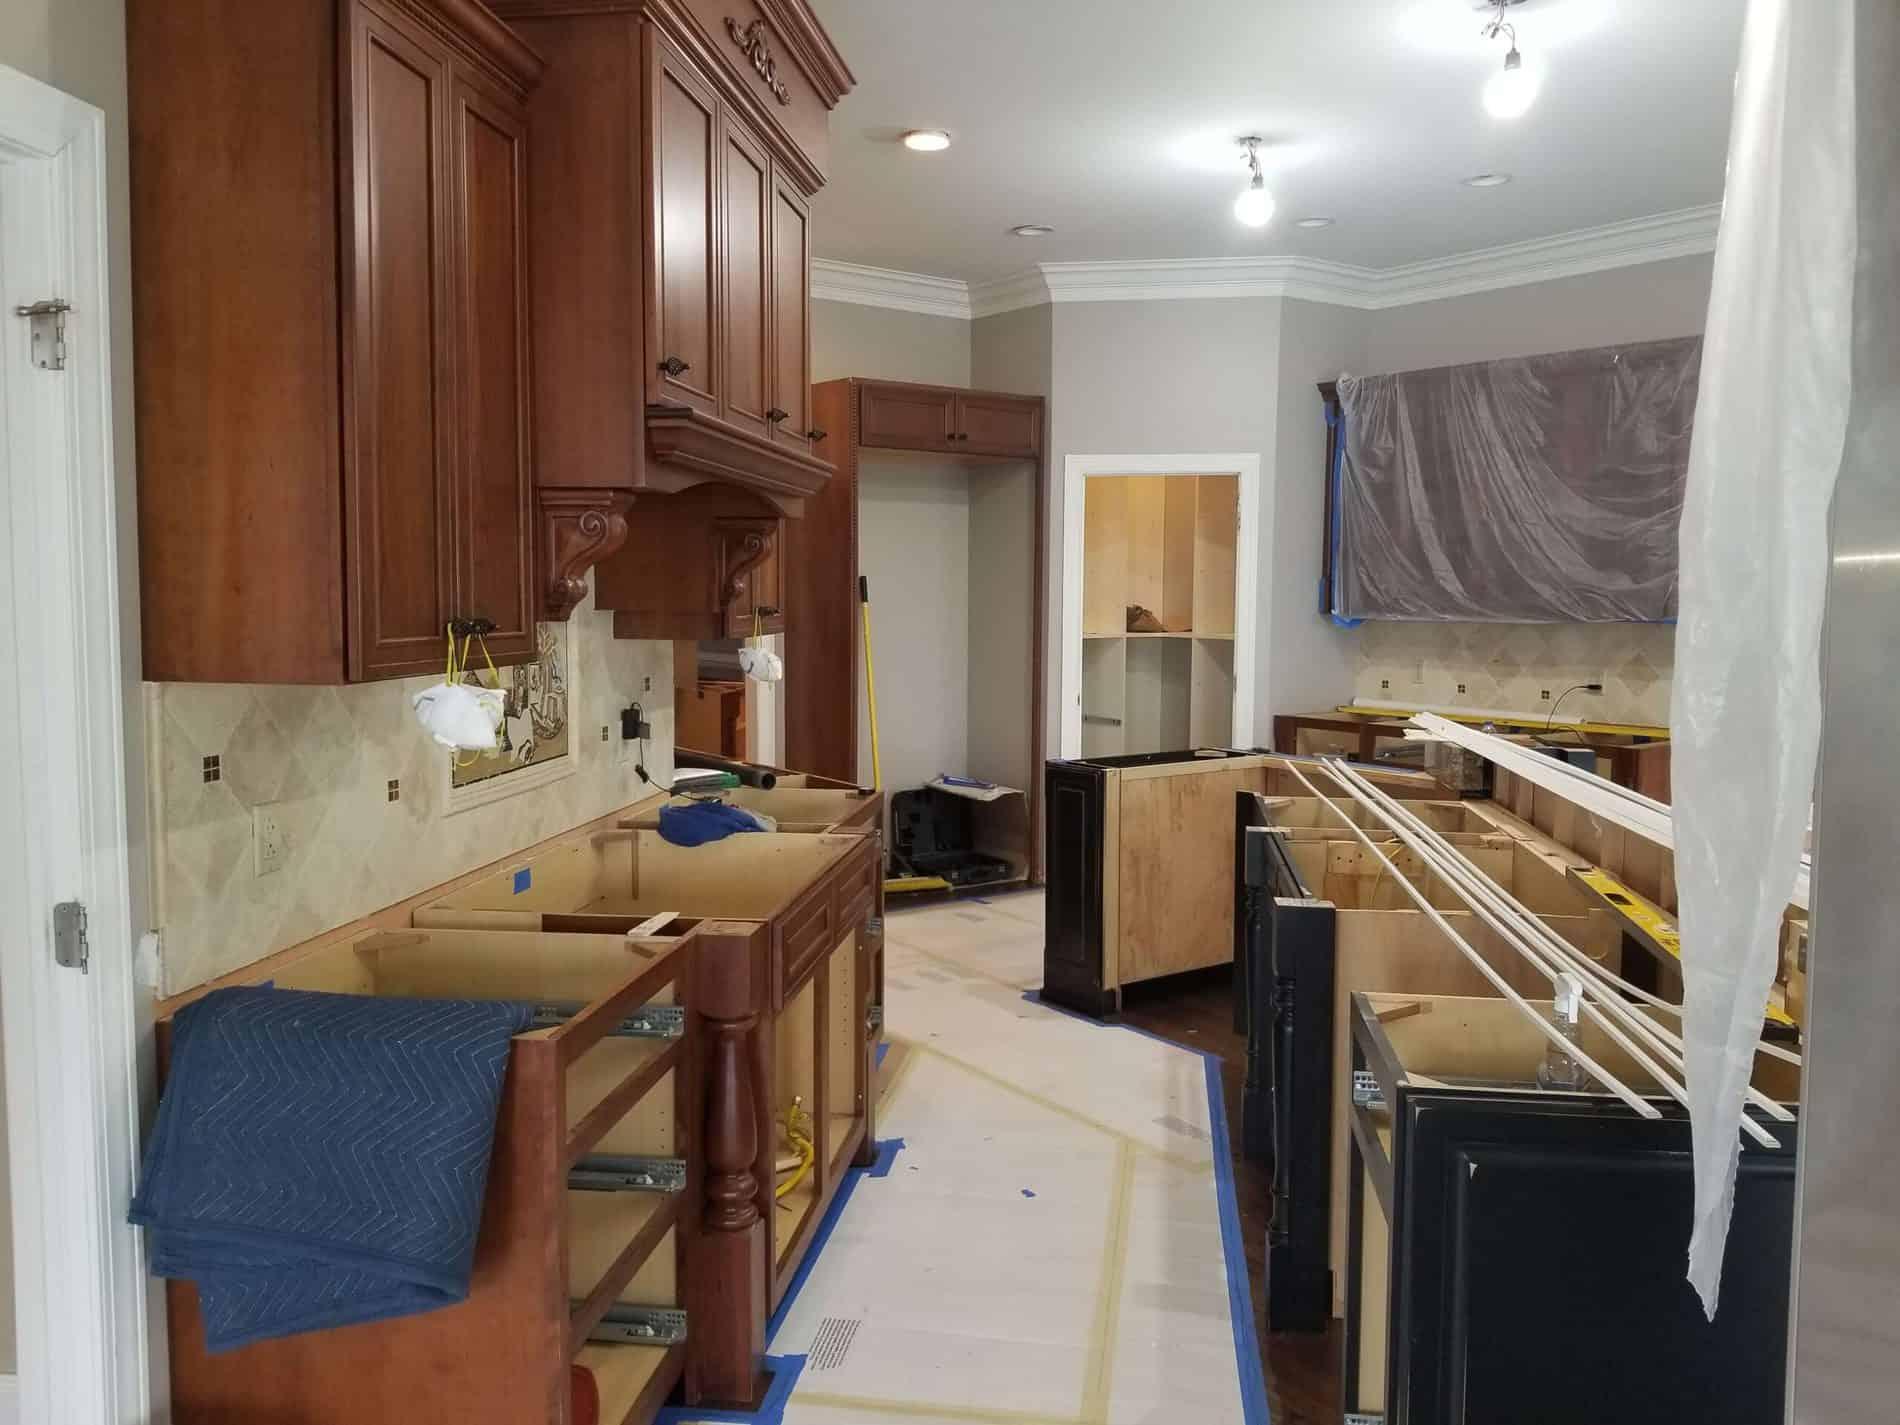 South Charleston Kitchen Renovation from Water Damage